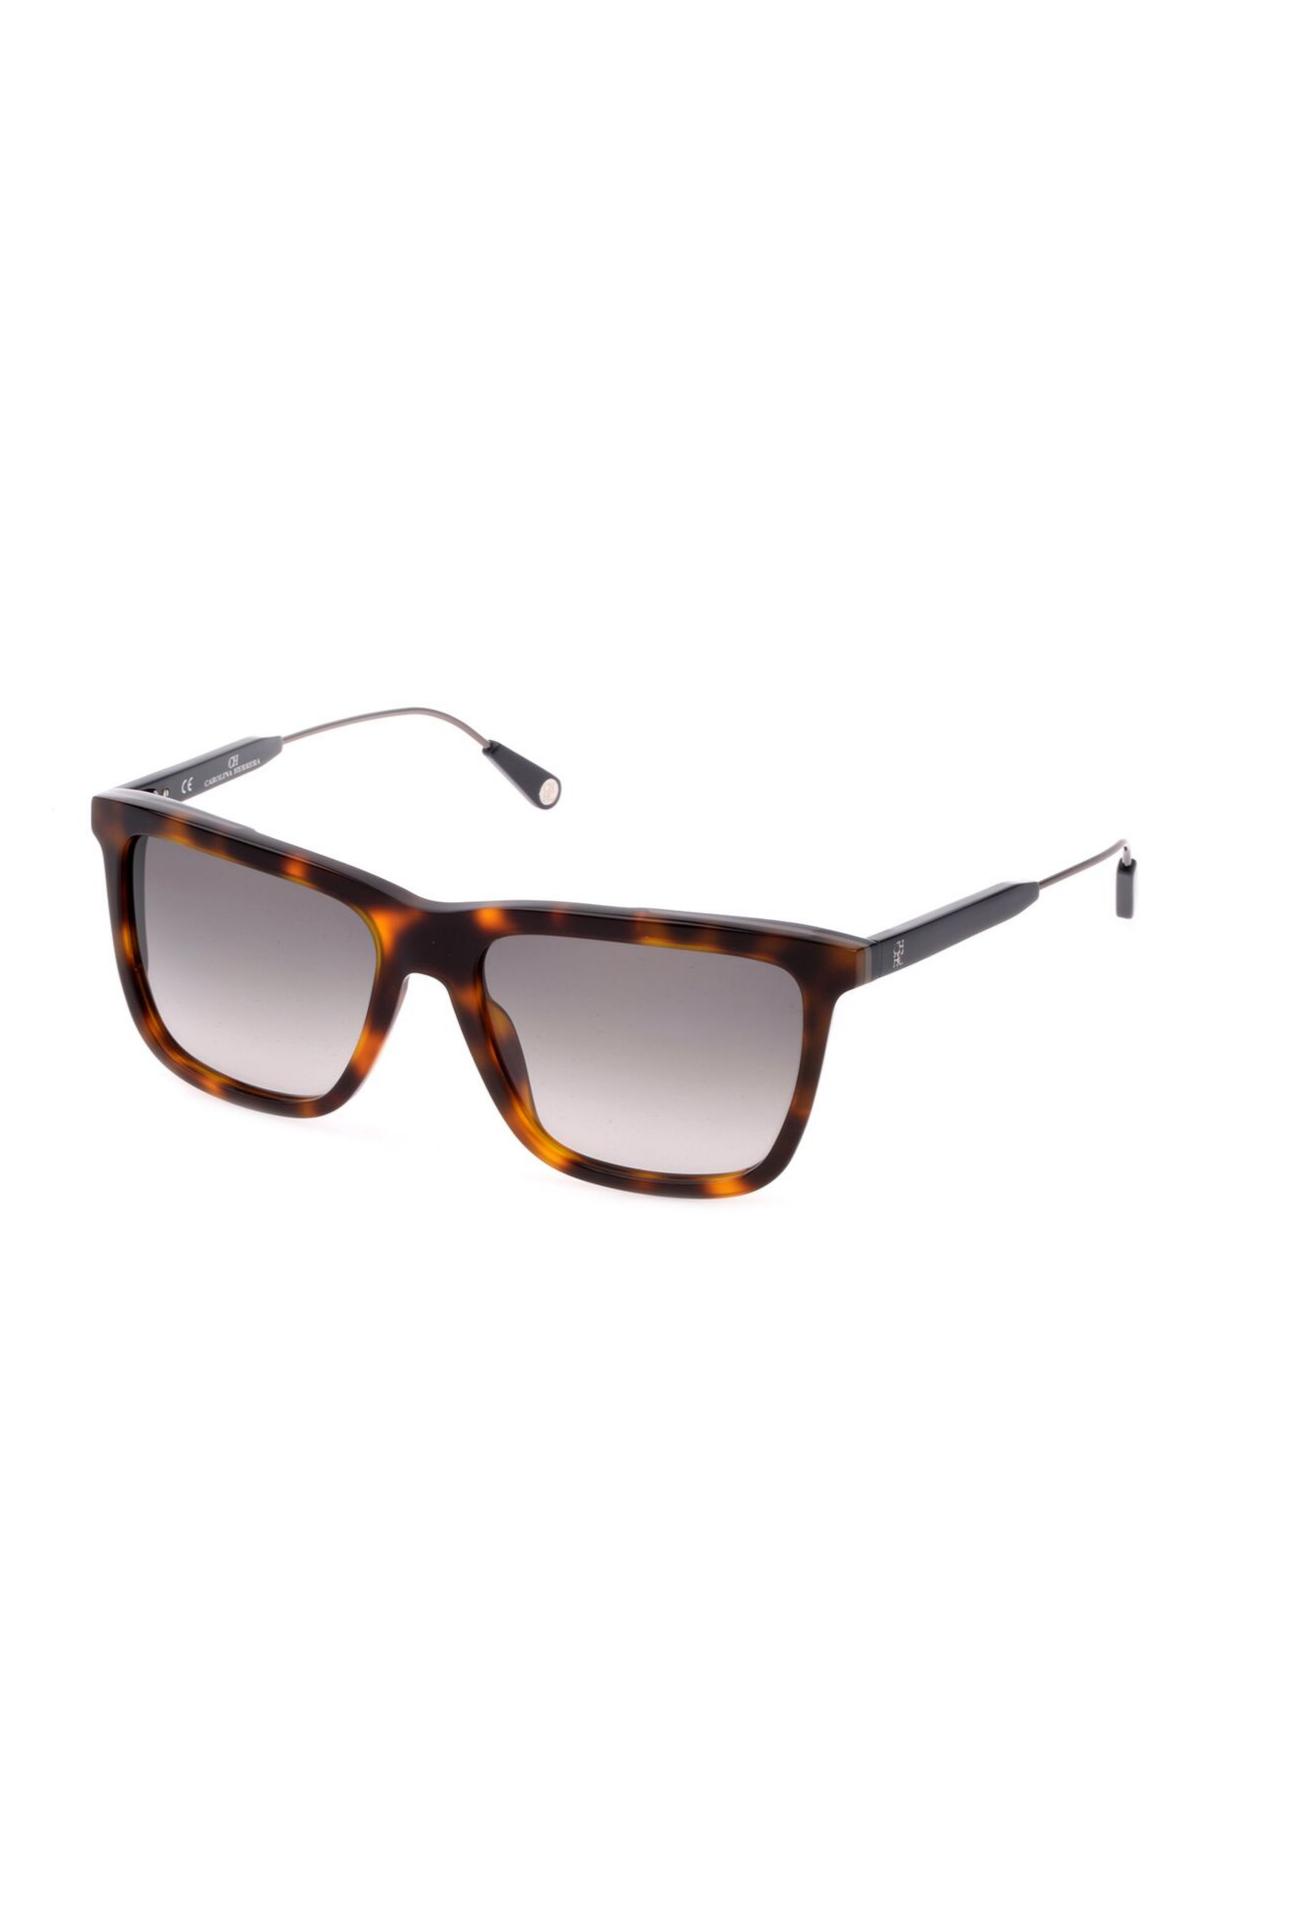 ch carolina herrera eyewear men